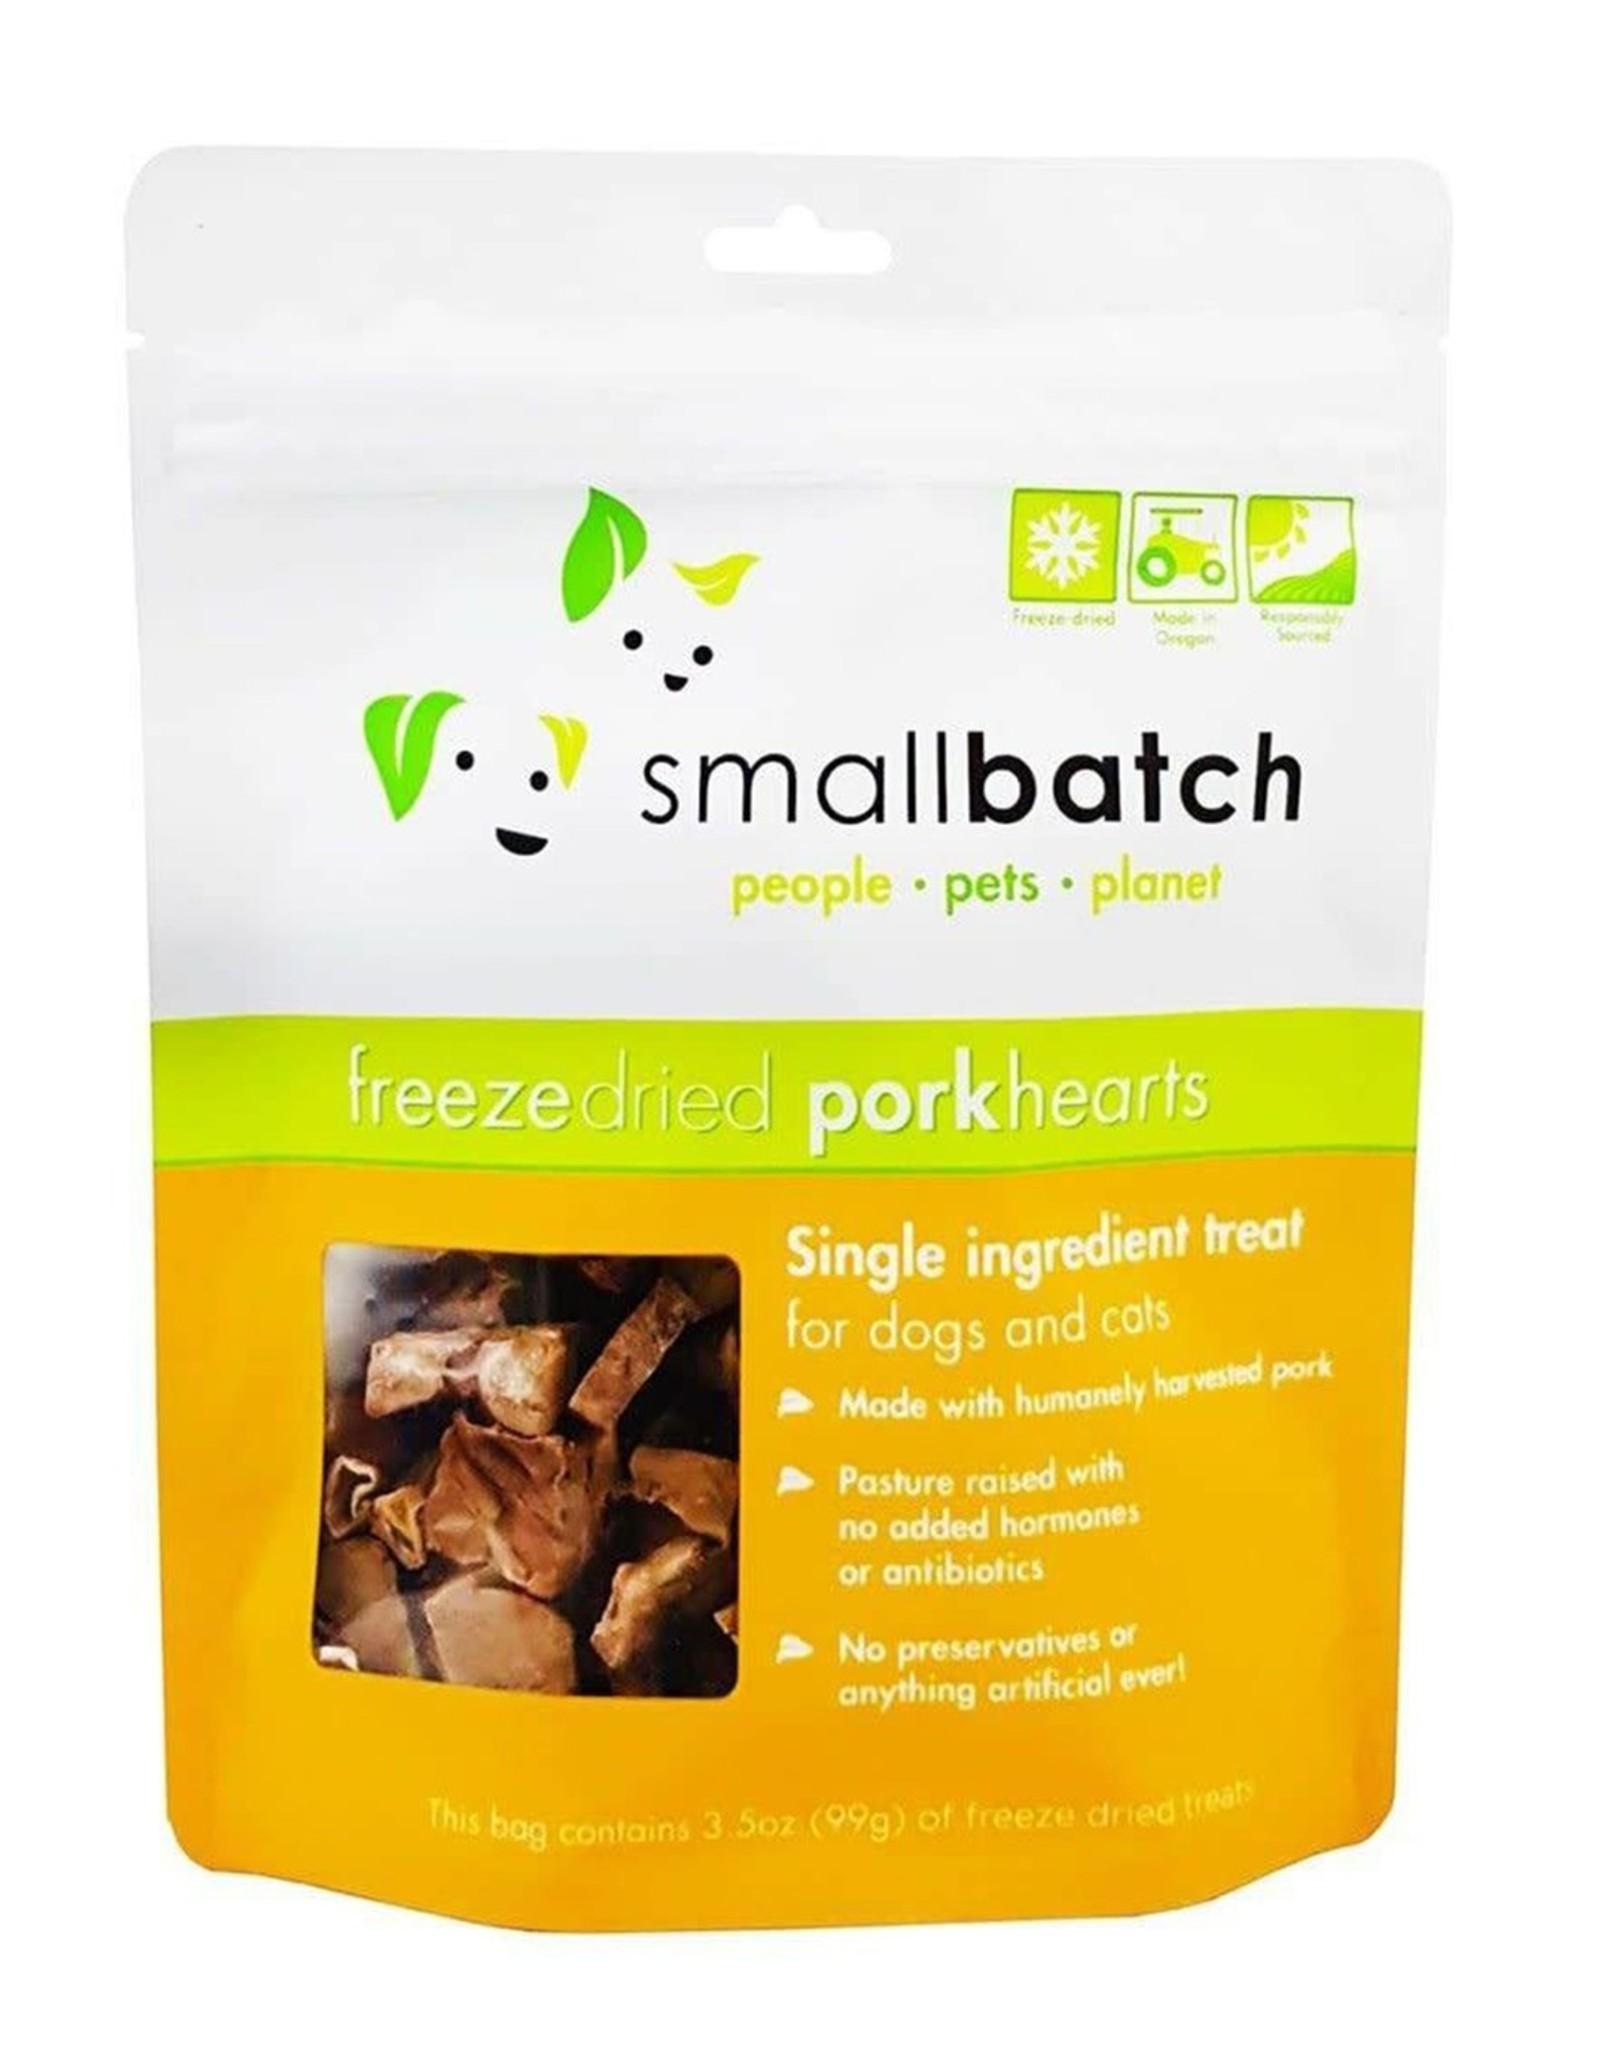 Small Batch Freeze-Dried Pork Hearts